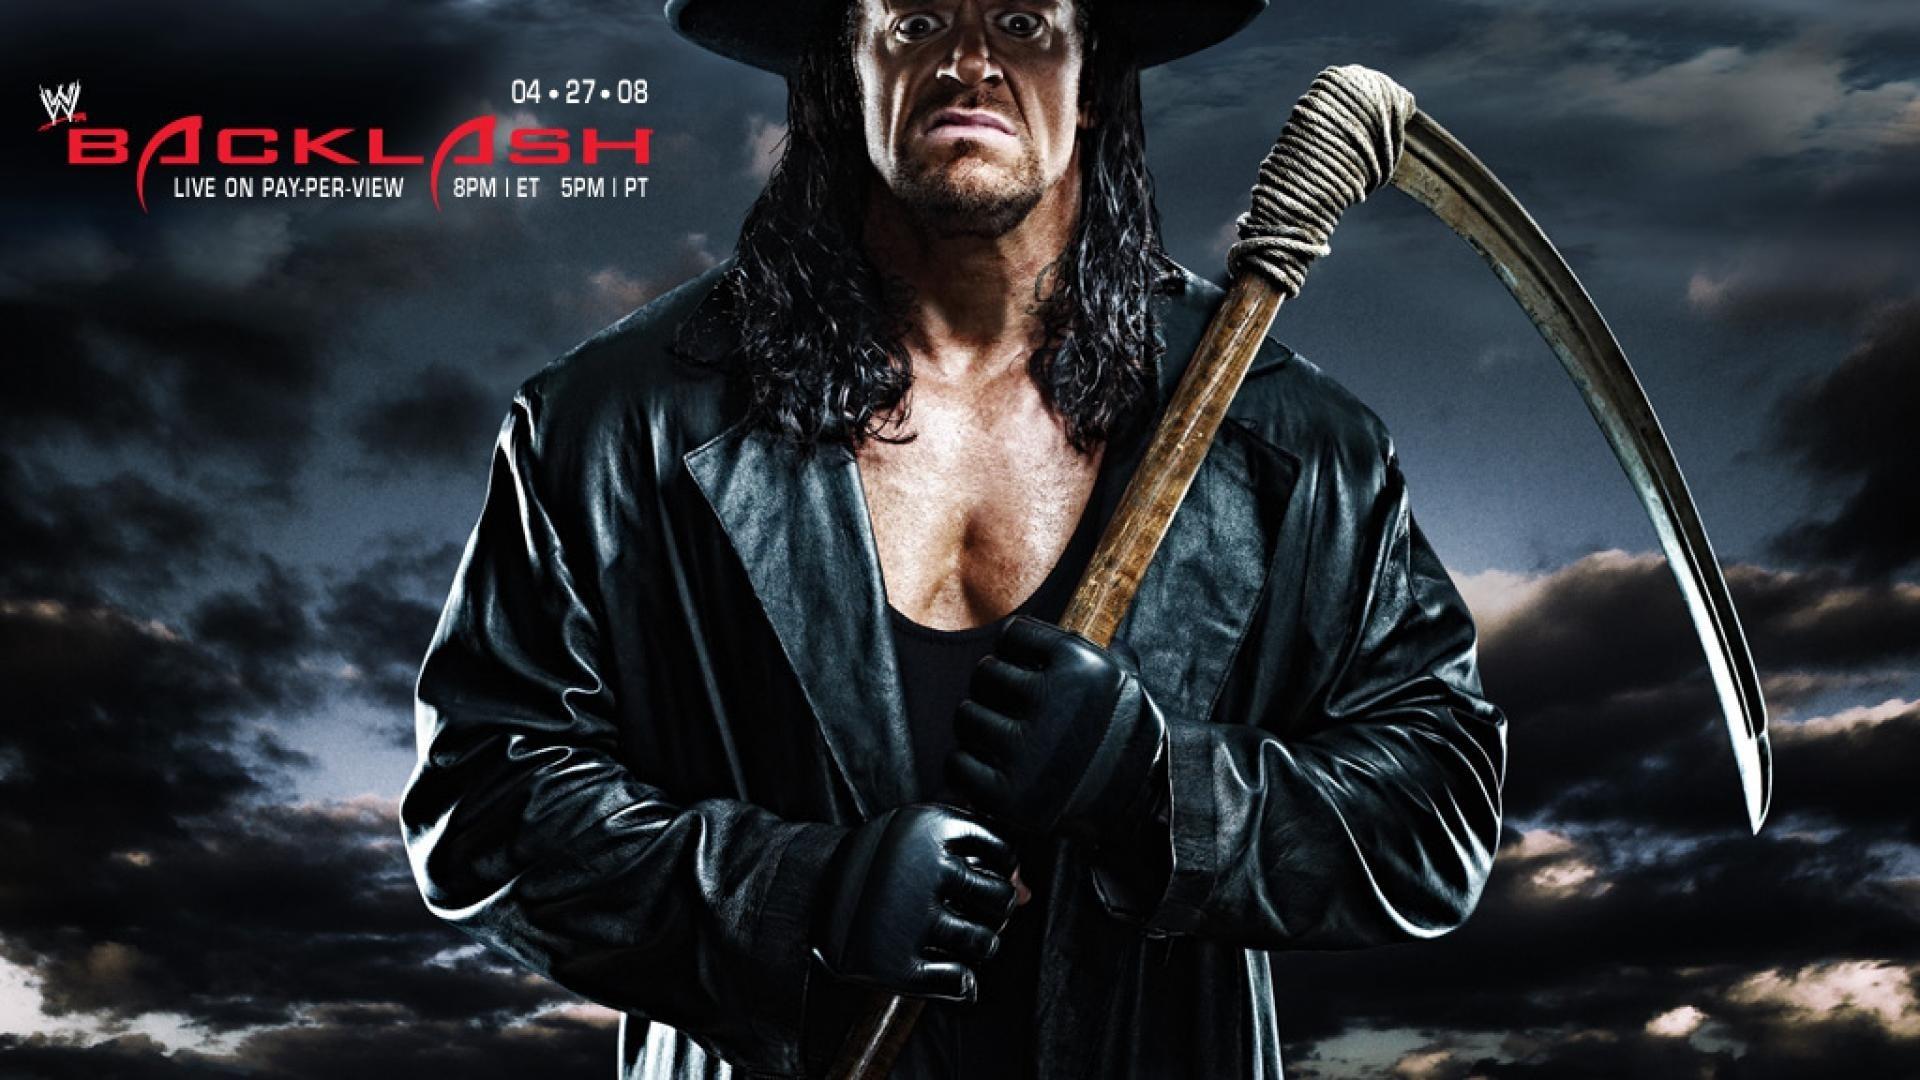 WWE NXT HD Images #WWENXTHDImages #WWENXT #wwe #nxt #wrestling  #hdwallpapers #wallpapers   WWE NXT HD Images   Pinterest   Wwe wallpapers  and Wallpaper